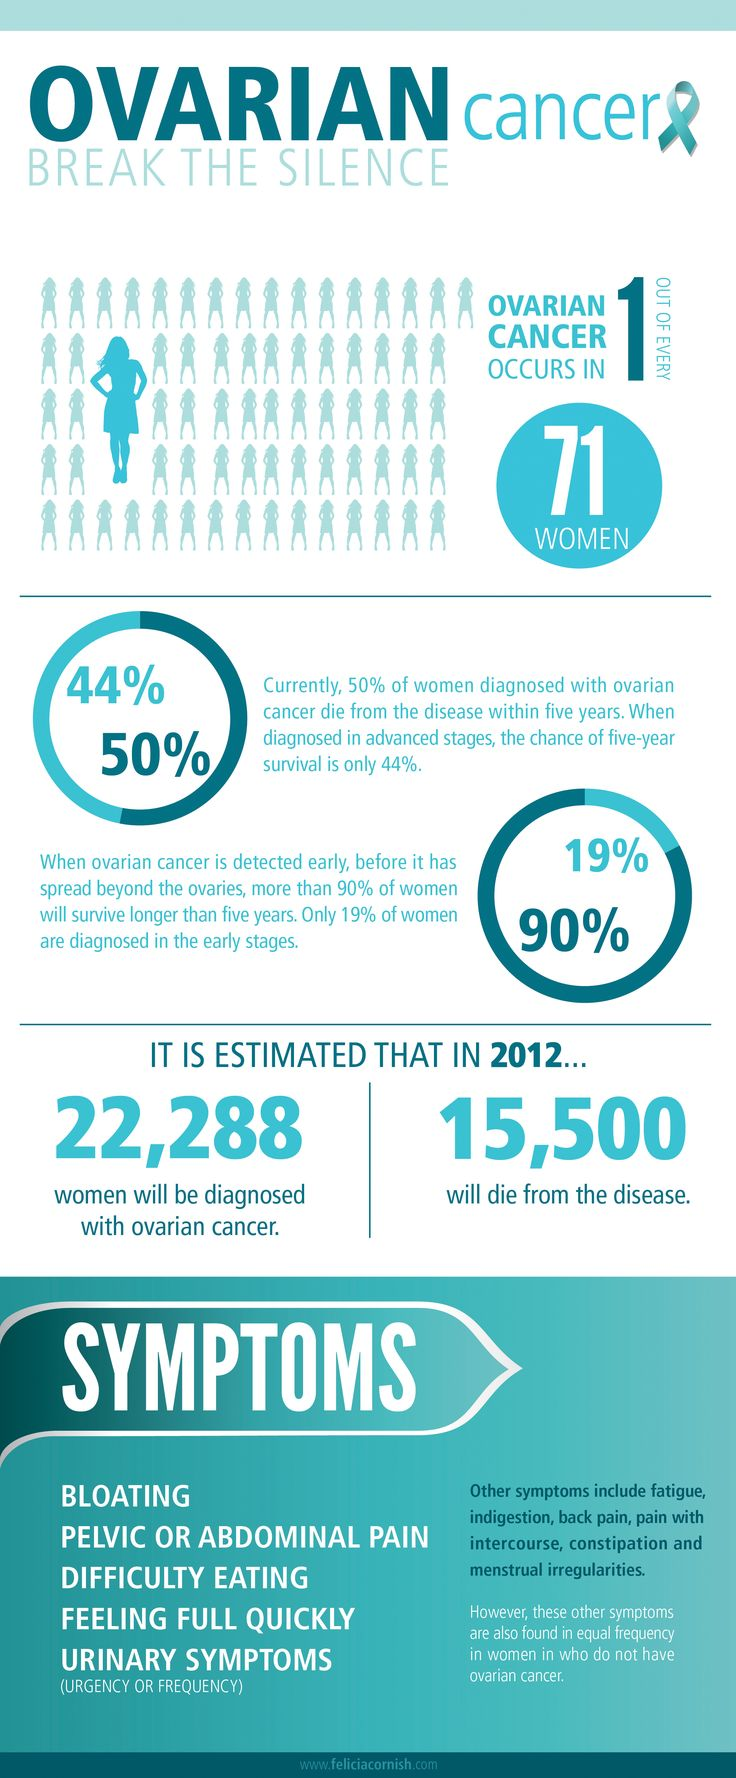 Ovarian Cancer Awareness Infographic #ovarian #teal